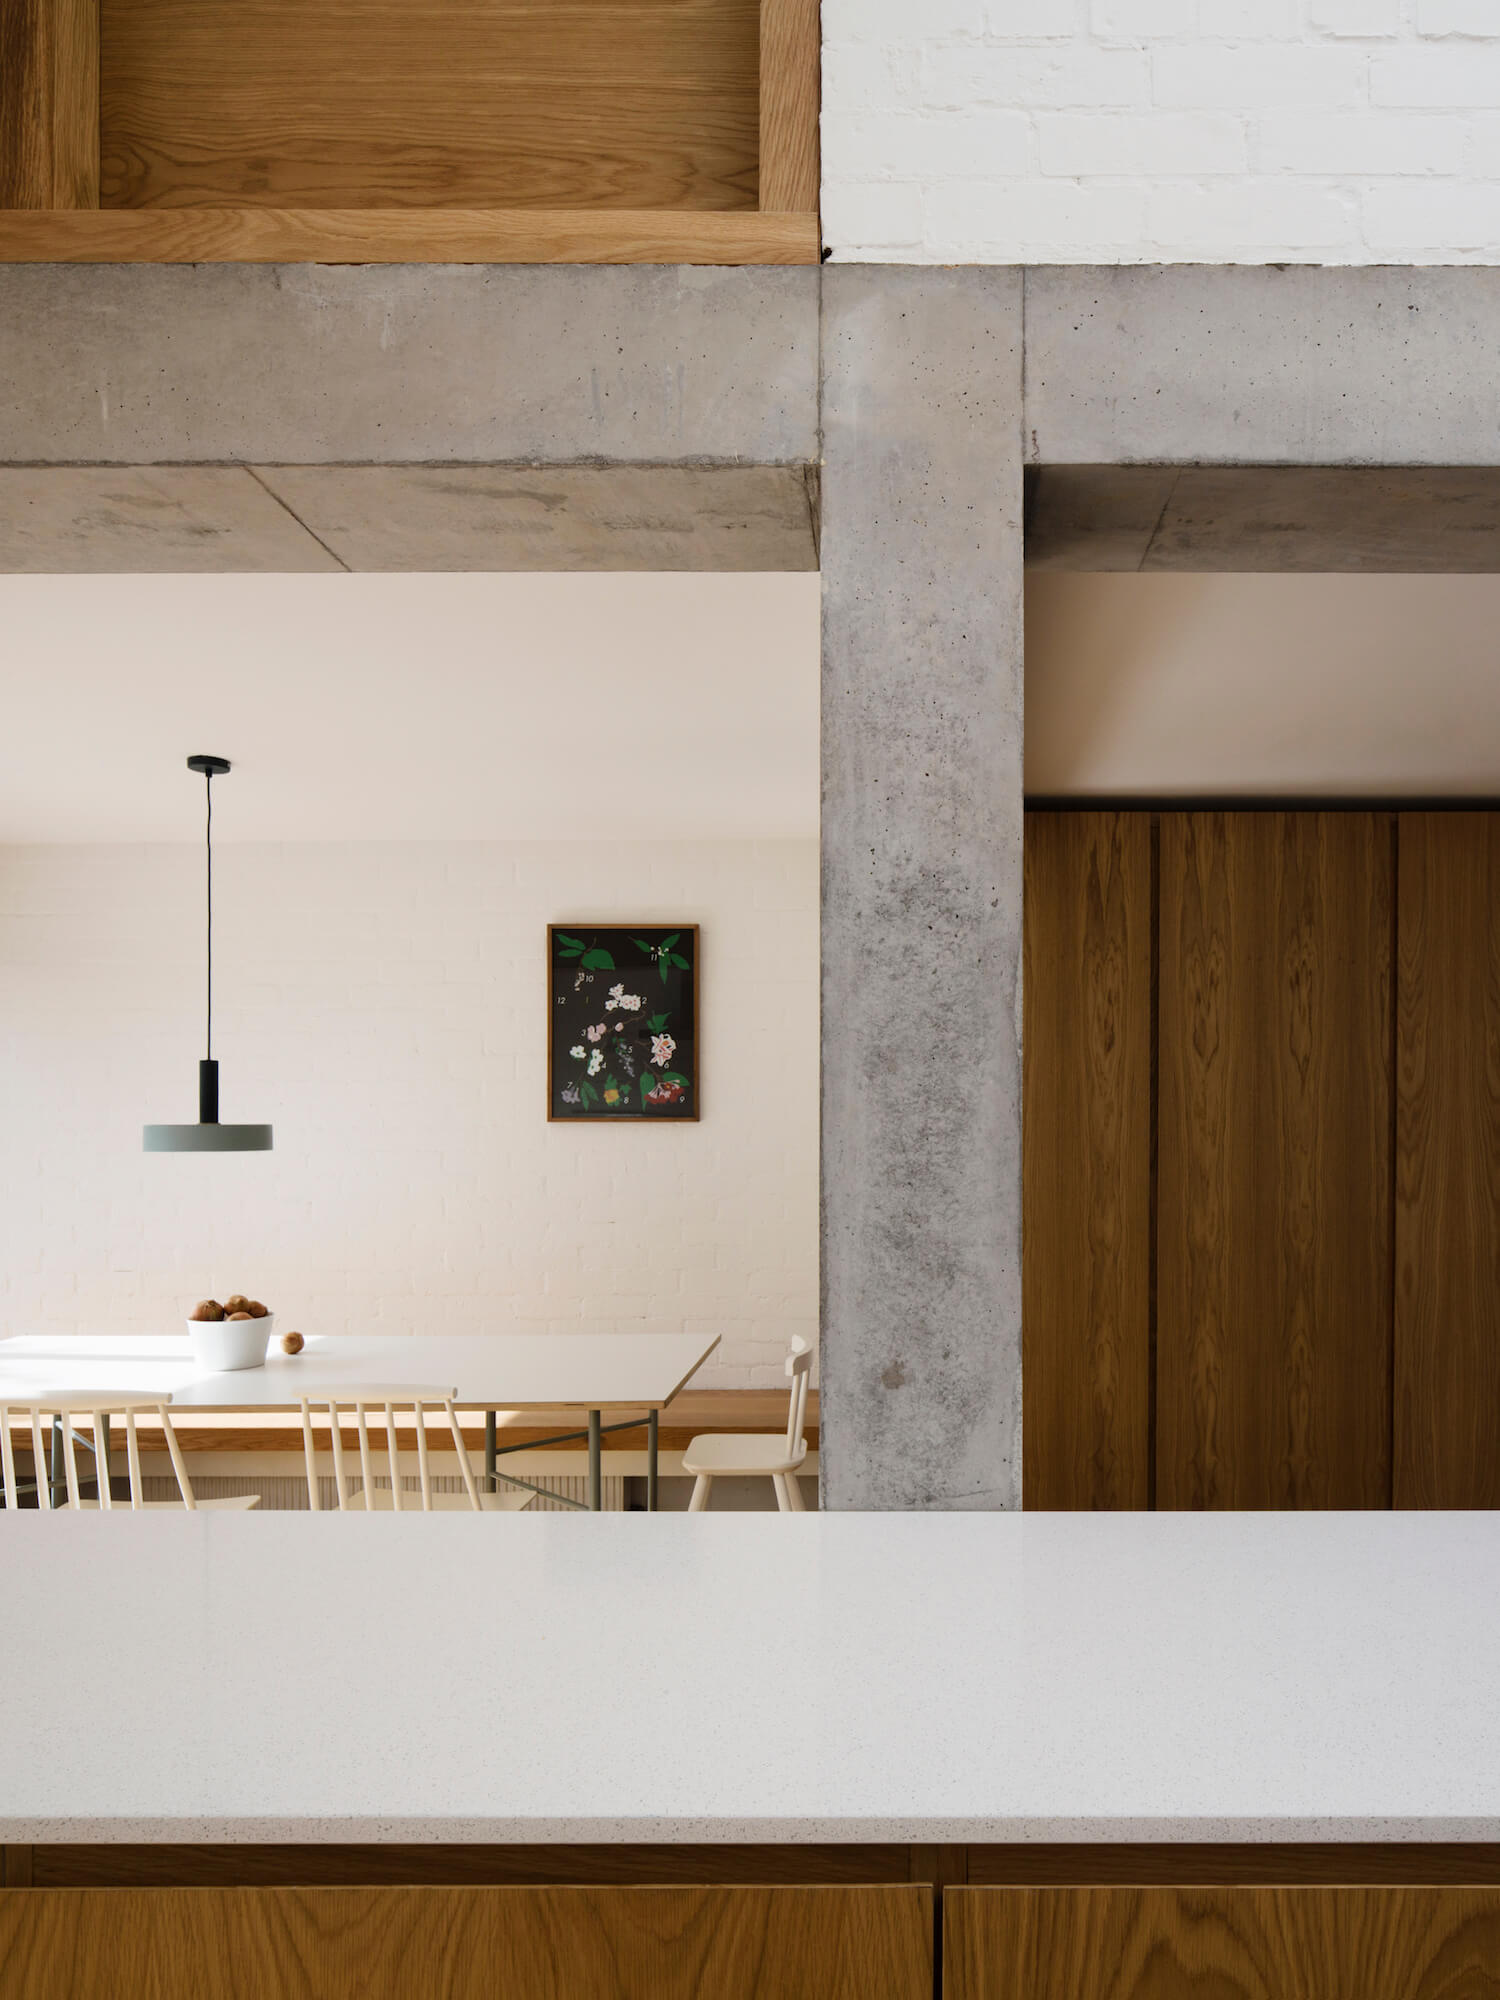 est living dublin house RWK architects 2